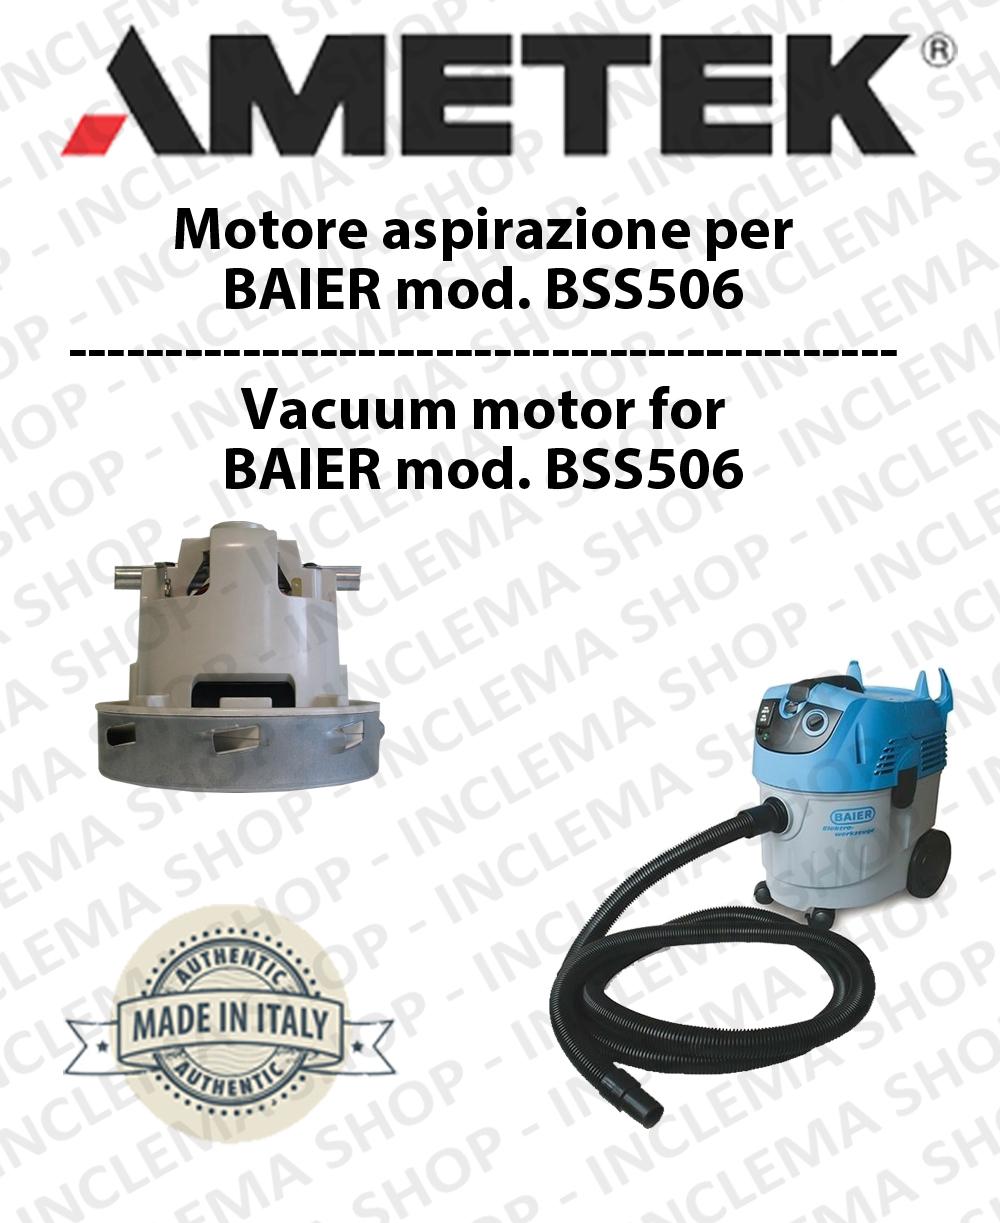 BSS506 Saugmotor AMETEK für Staubsauger und trockensauger BAIER